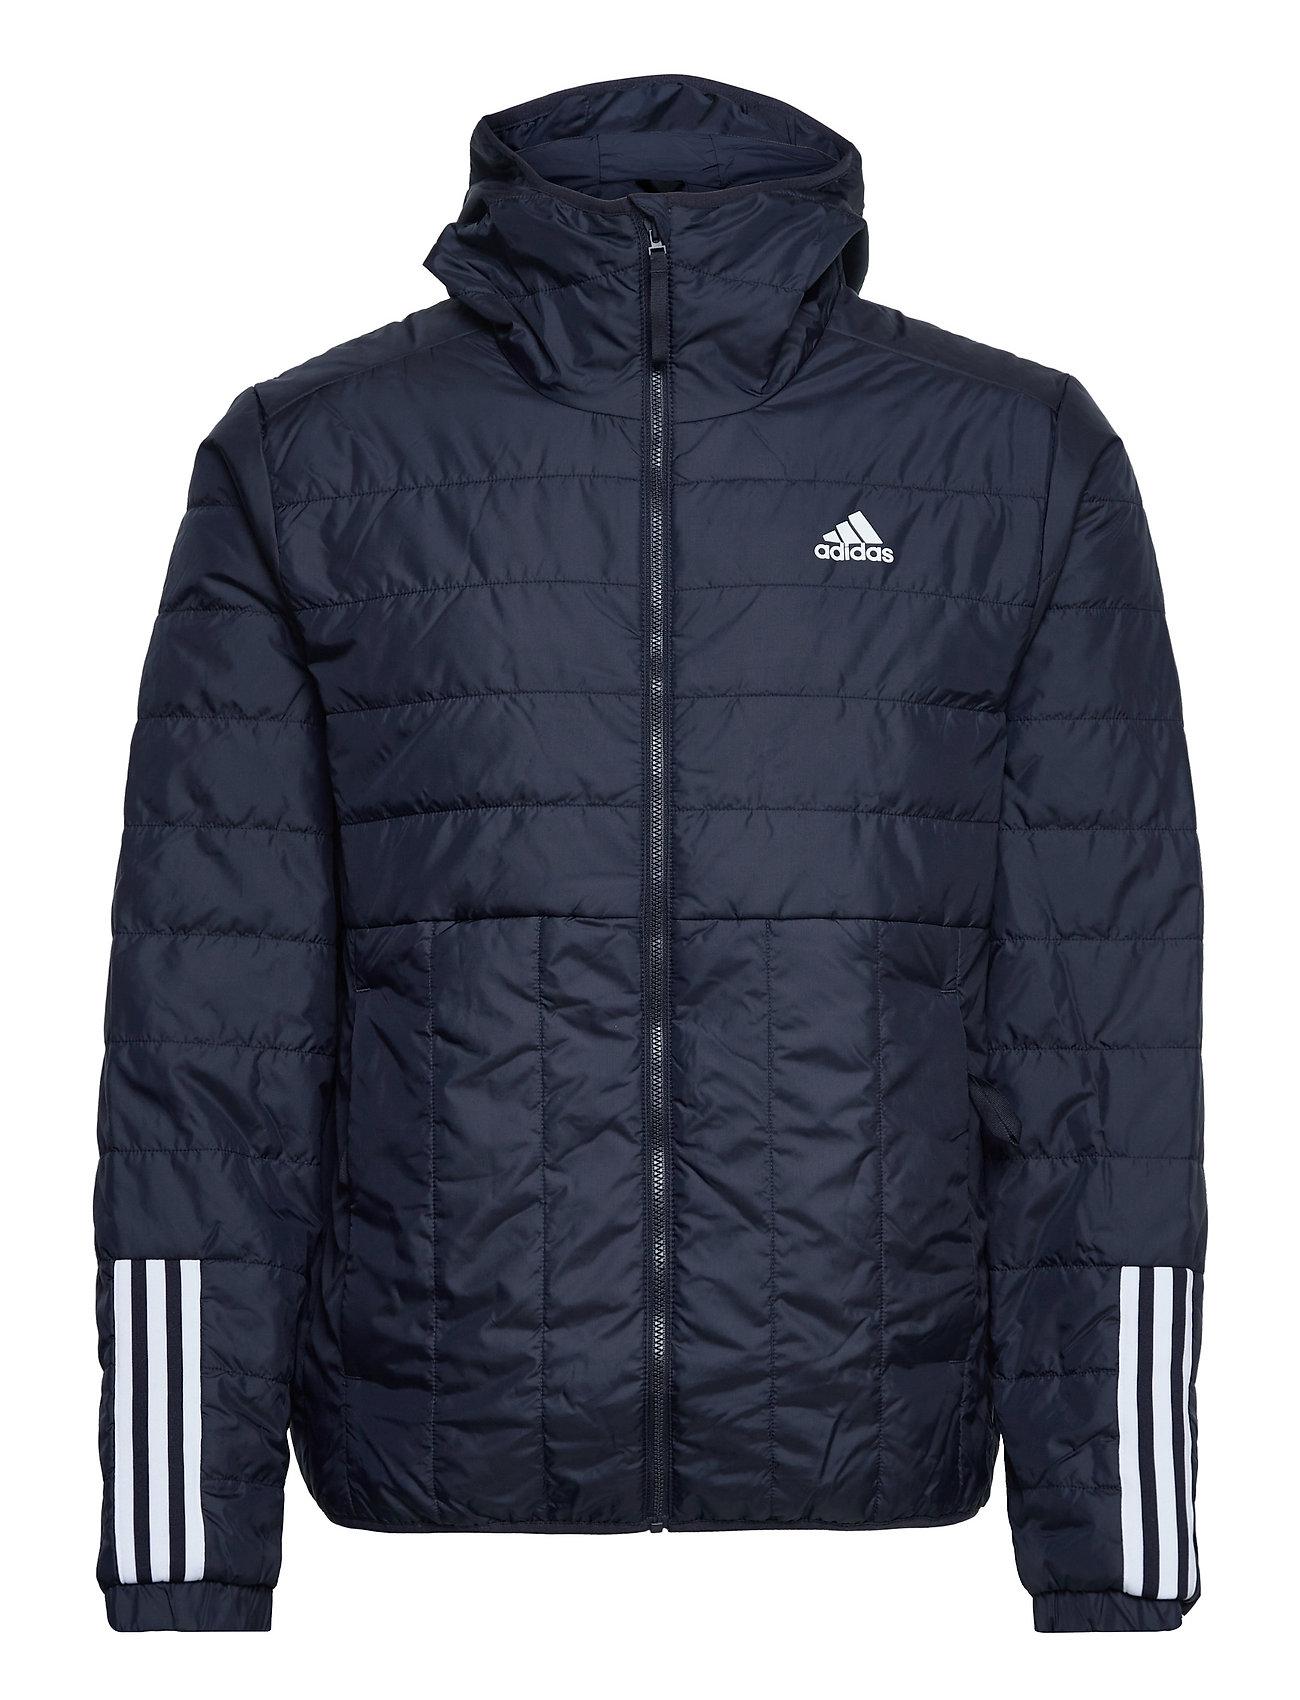 Itavic 3-Stripes Light Hooded Jacket Outerwear Sport Jackets Blå Adidas Performance